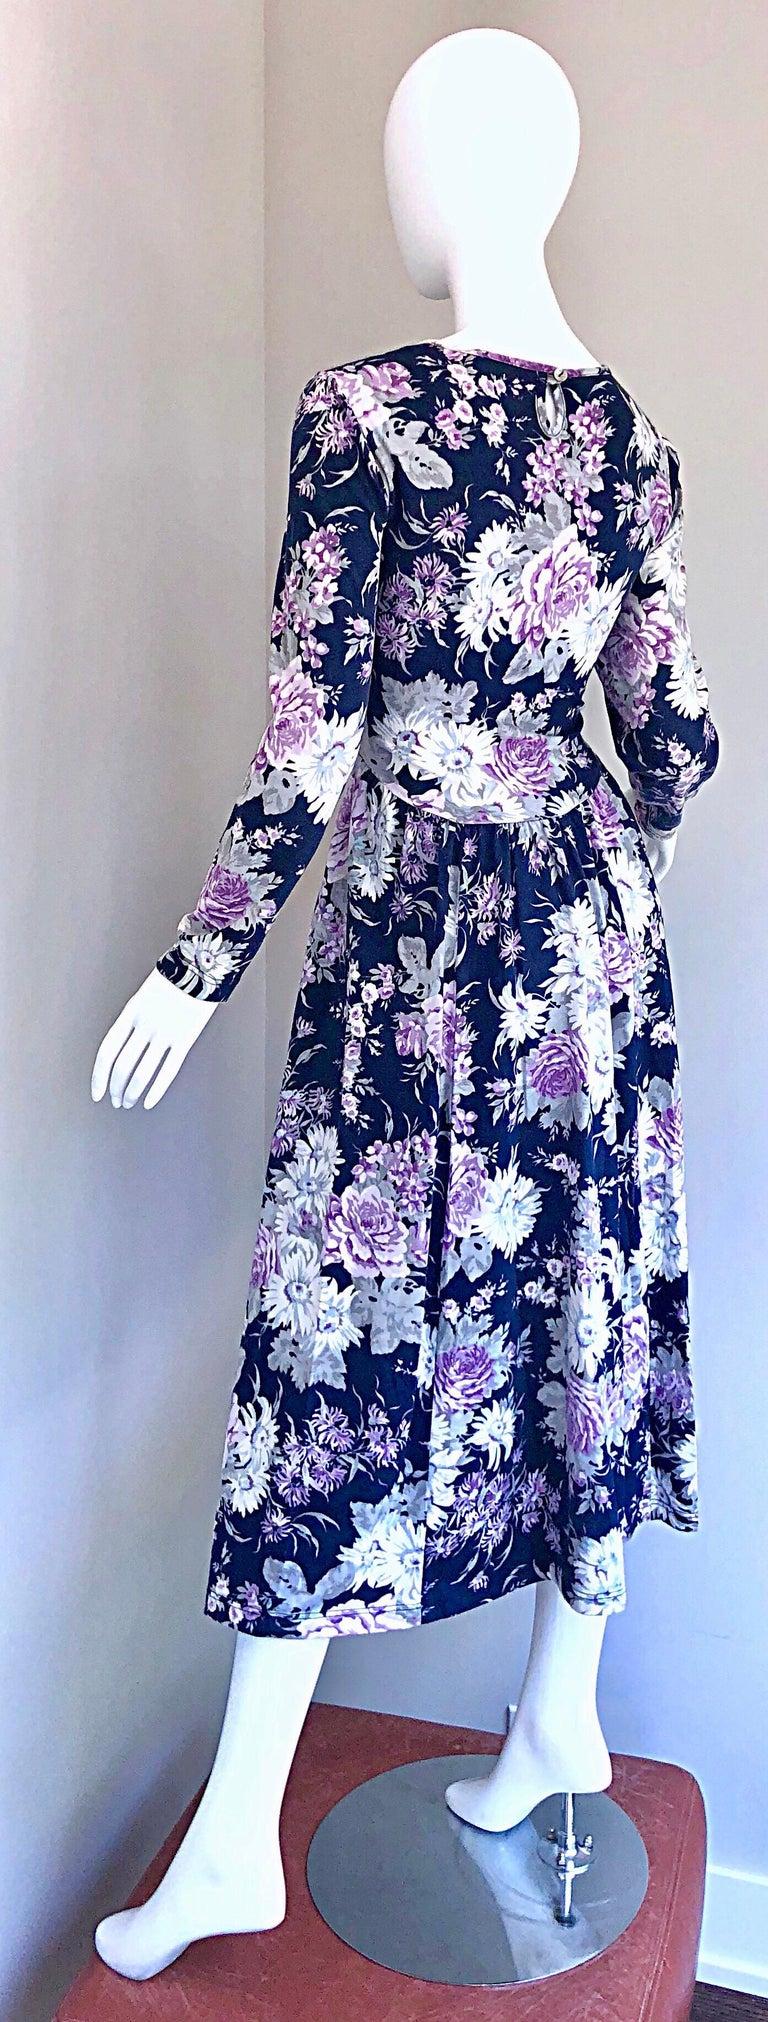 1990s Laura Ashley Navy Blue + Purple Long Sleeve Cotton Vintage 90s Midi Dress For Sale 8